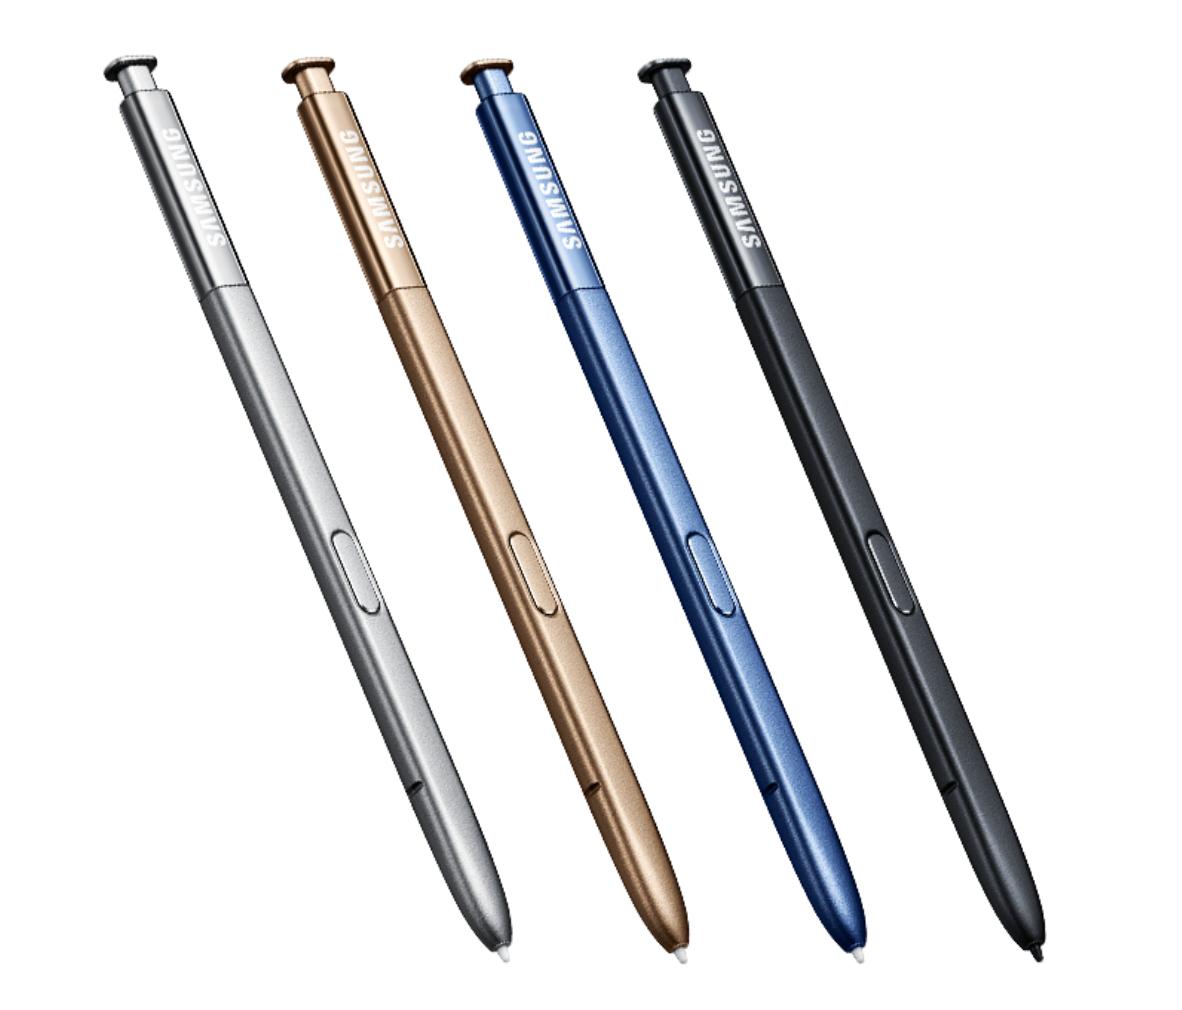 Samsung Galaxy Note 7 S Pen Colors